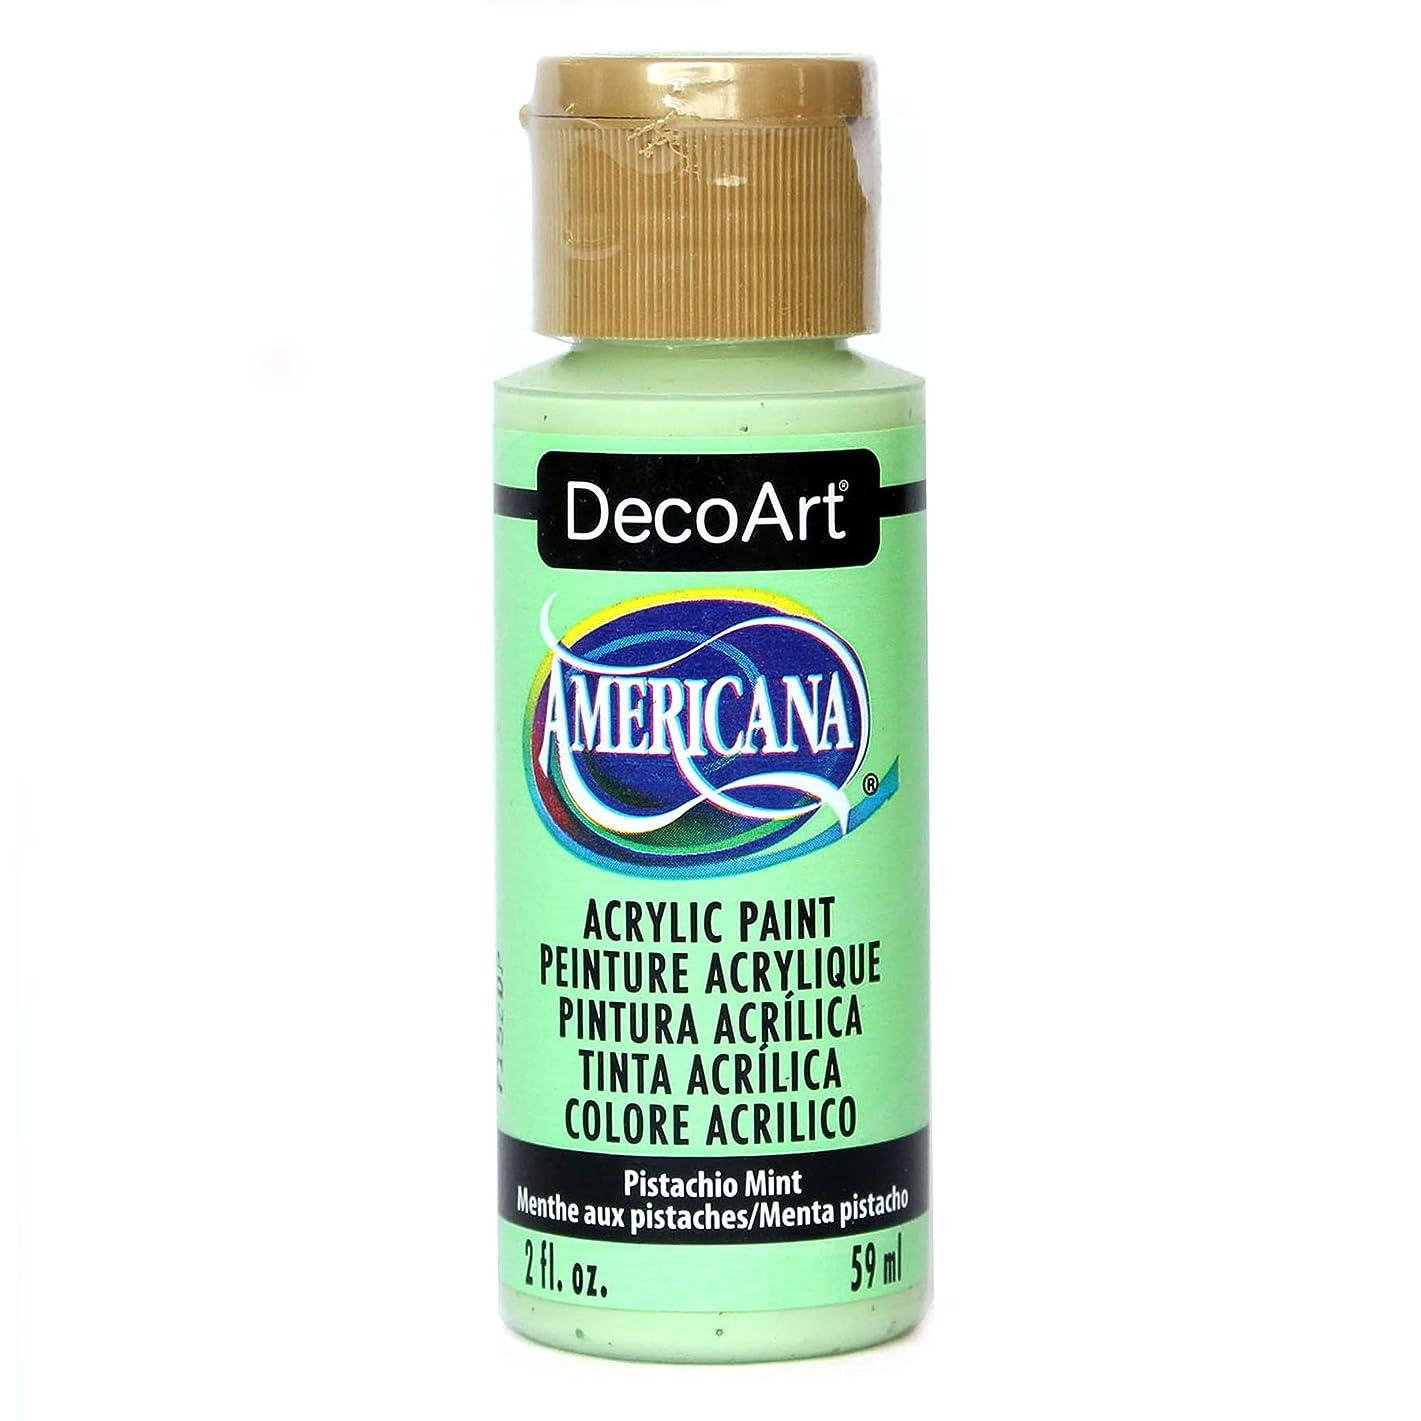 DecoArt Americana Acrylic Paint, 2-Ounce, Pistachio Mint